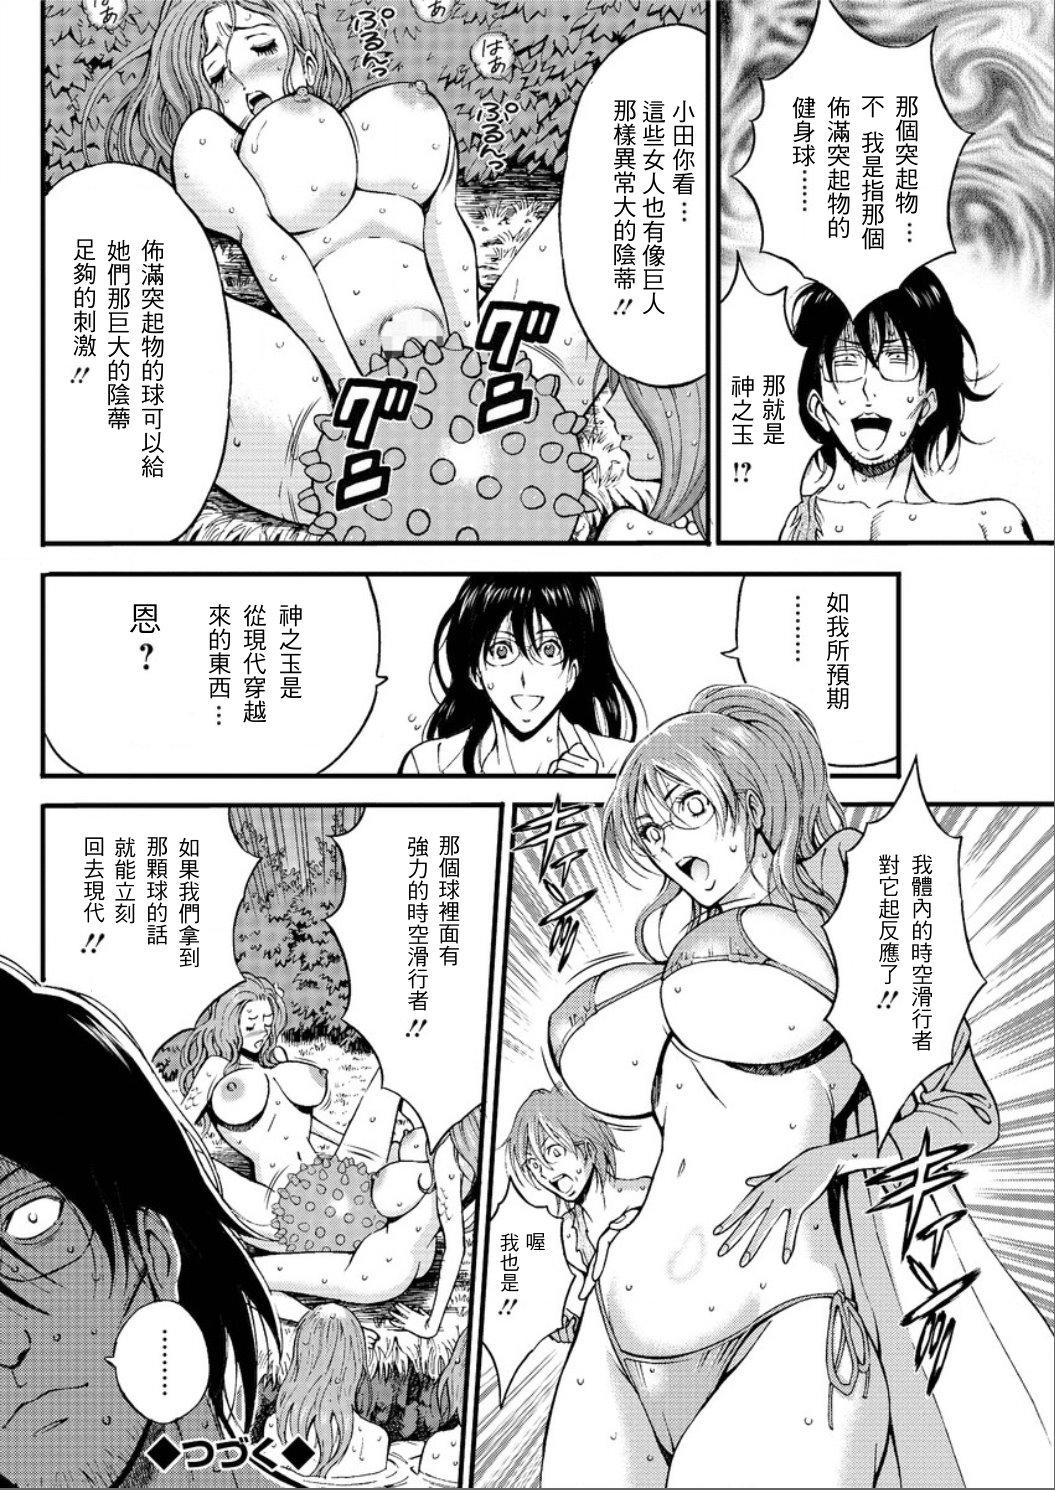 Kigenzen 10000 Nen no Ota | 史前一萬年的宅男 Ch. 19-24 19